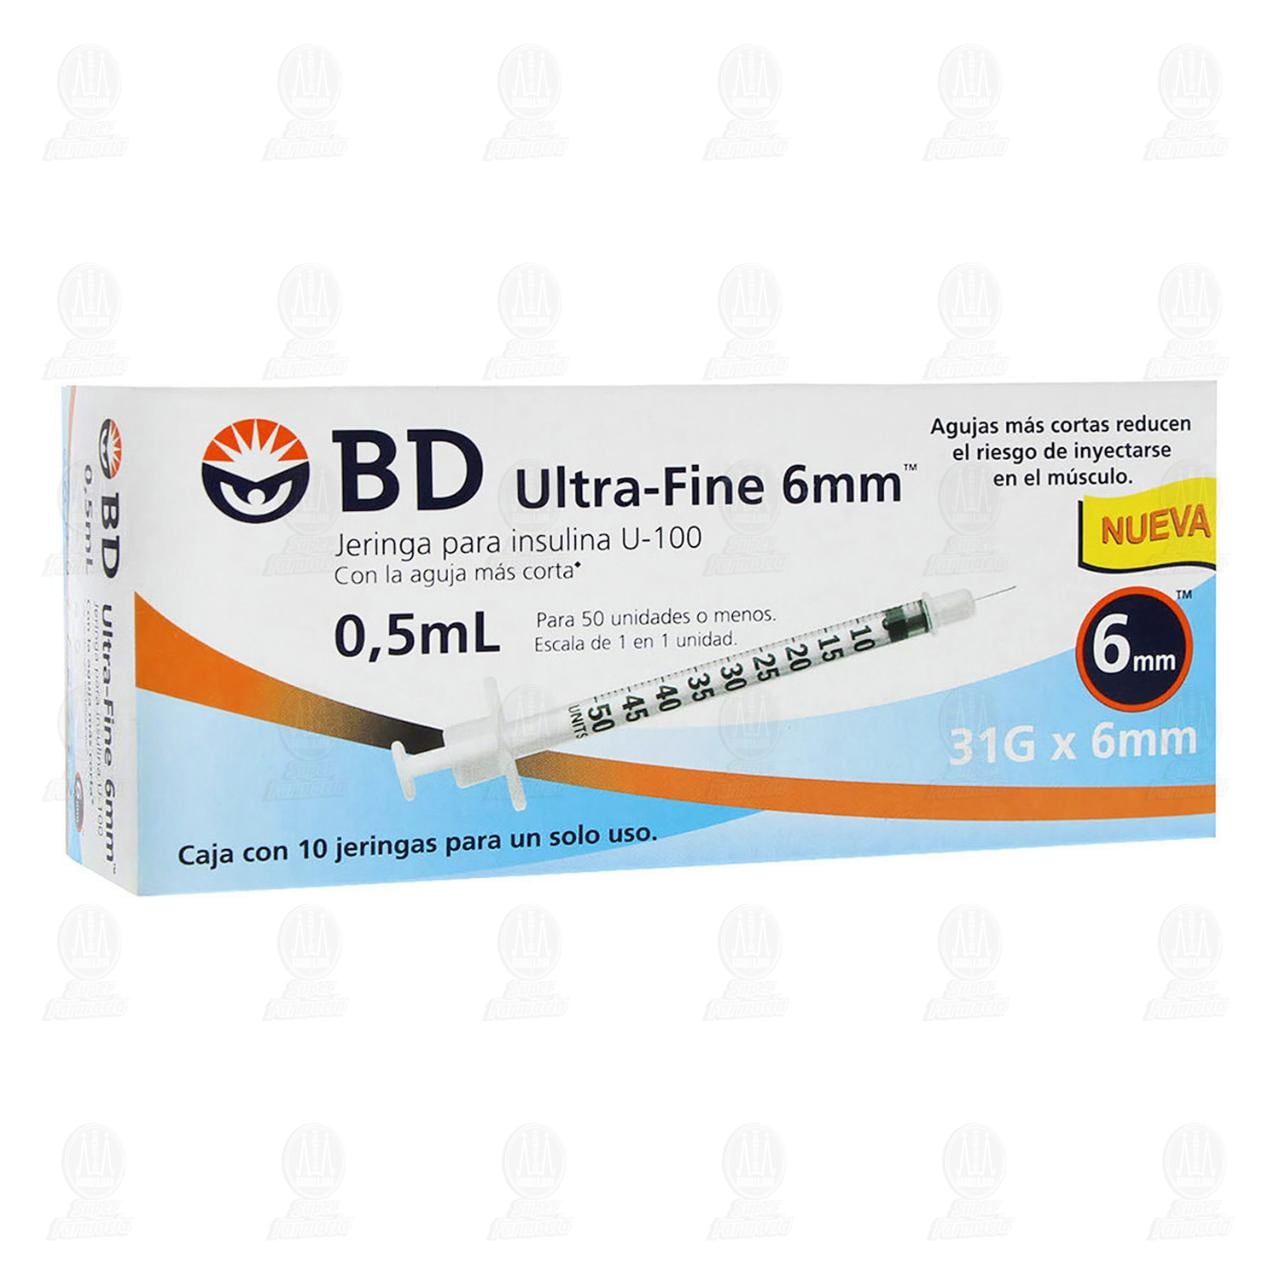 Jeringa BD Ultra Fine Insulina 0.5ml 31G x 6mm 10 Piezas